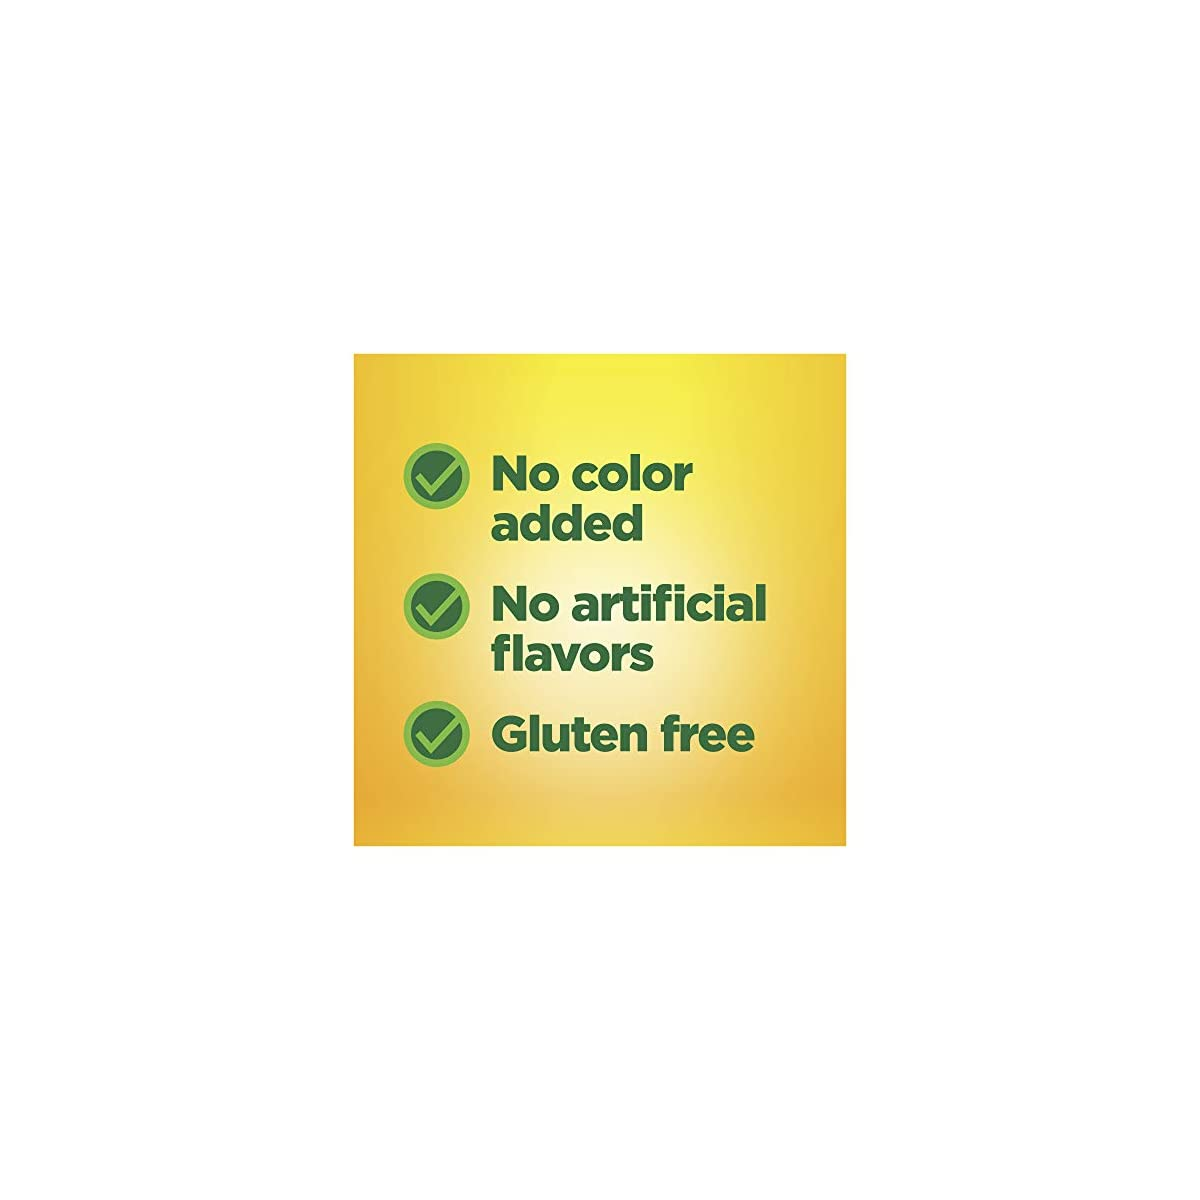 Nature Made Vitamin D3 1000 Iu 25 Mcg Softgels 300 Count For Bone Health Packaging May Vary Sense Therapeutic